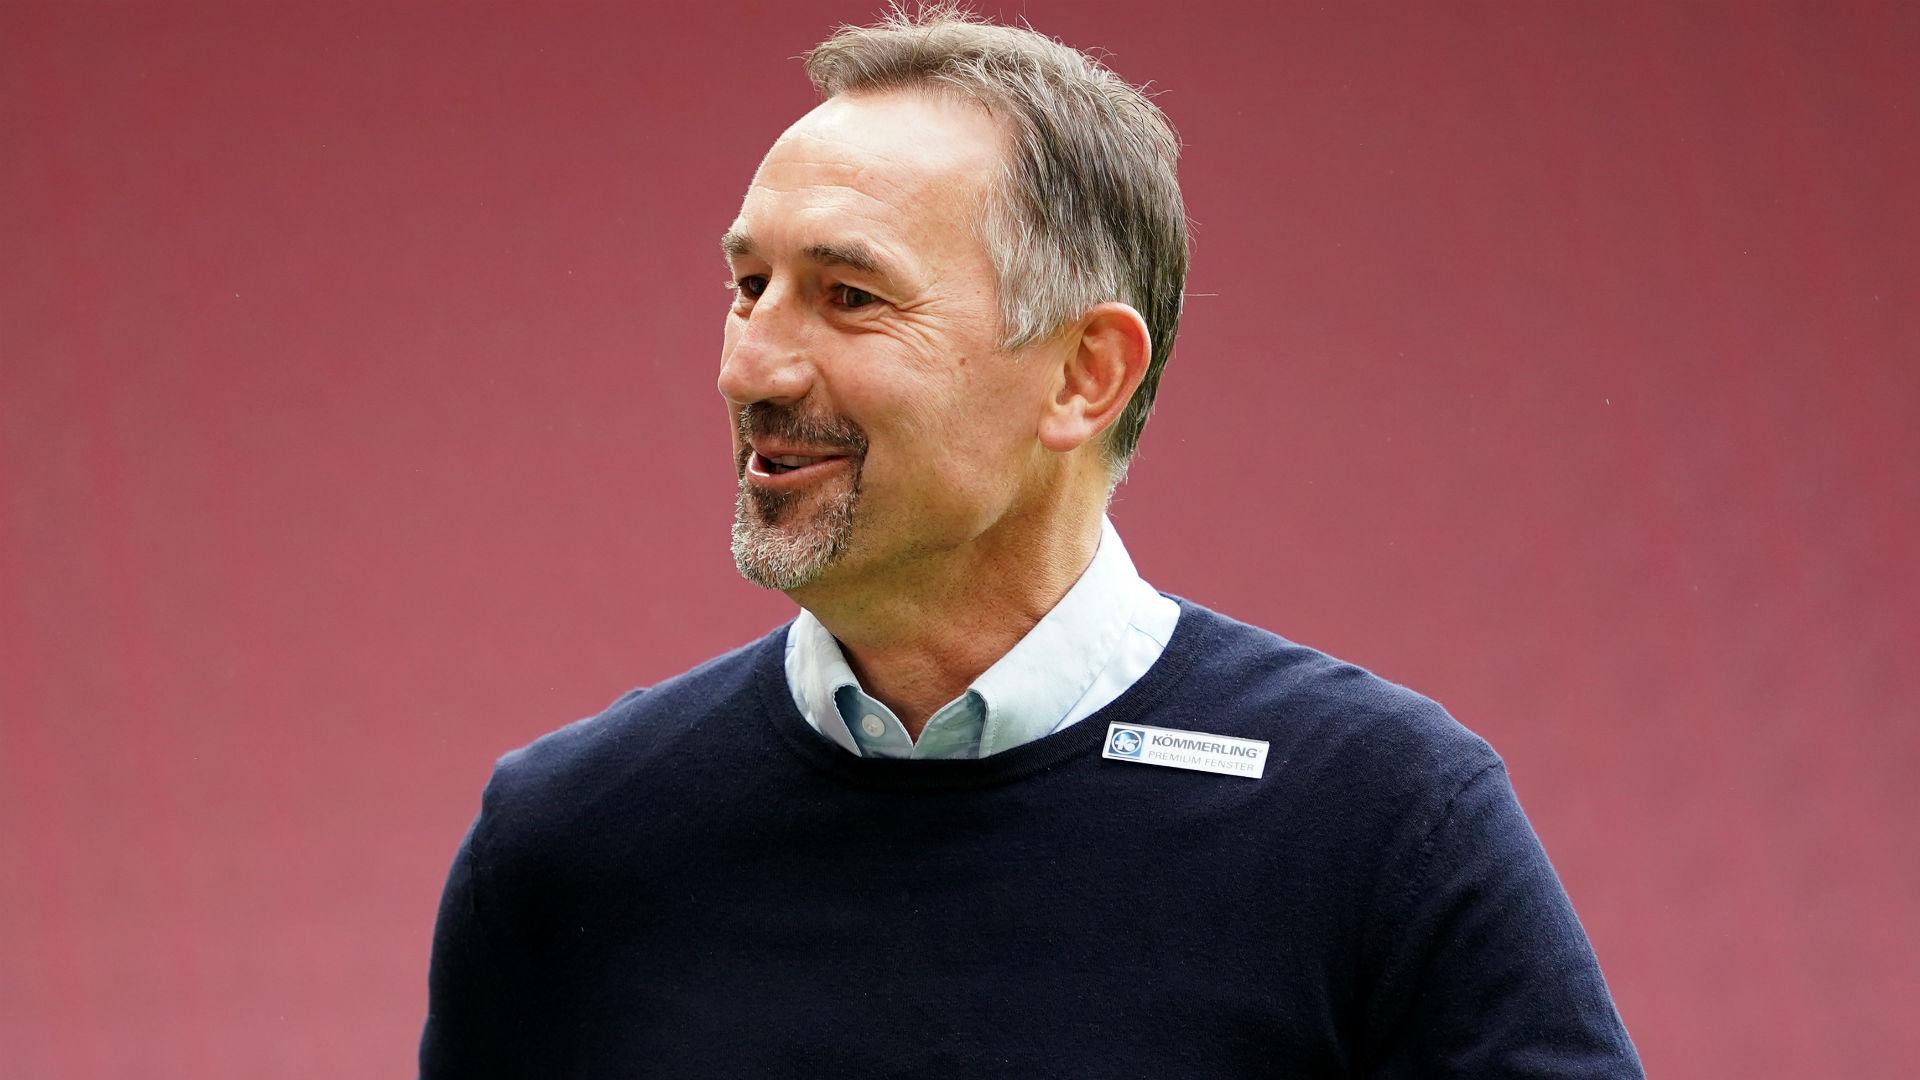 Beierlorzer left 'disappointed' as struggling Mainz sack coach